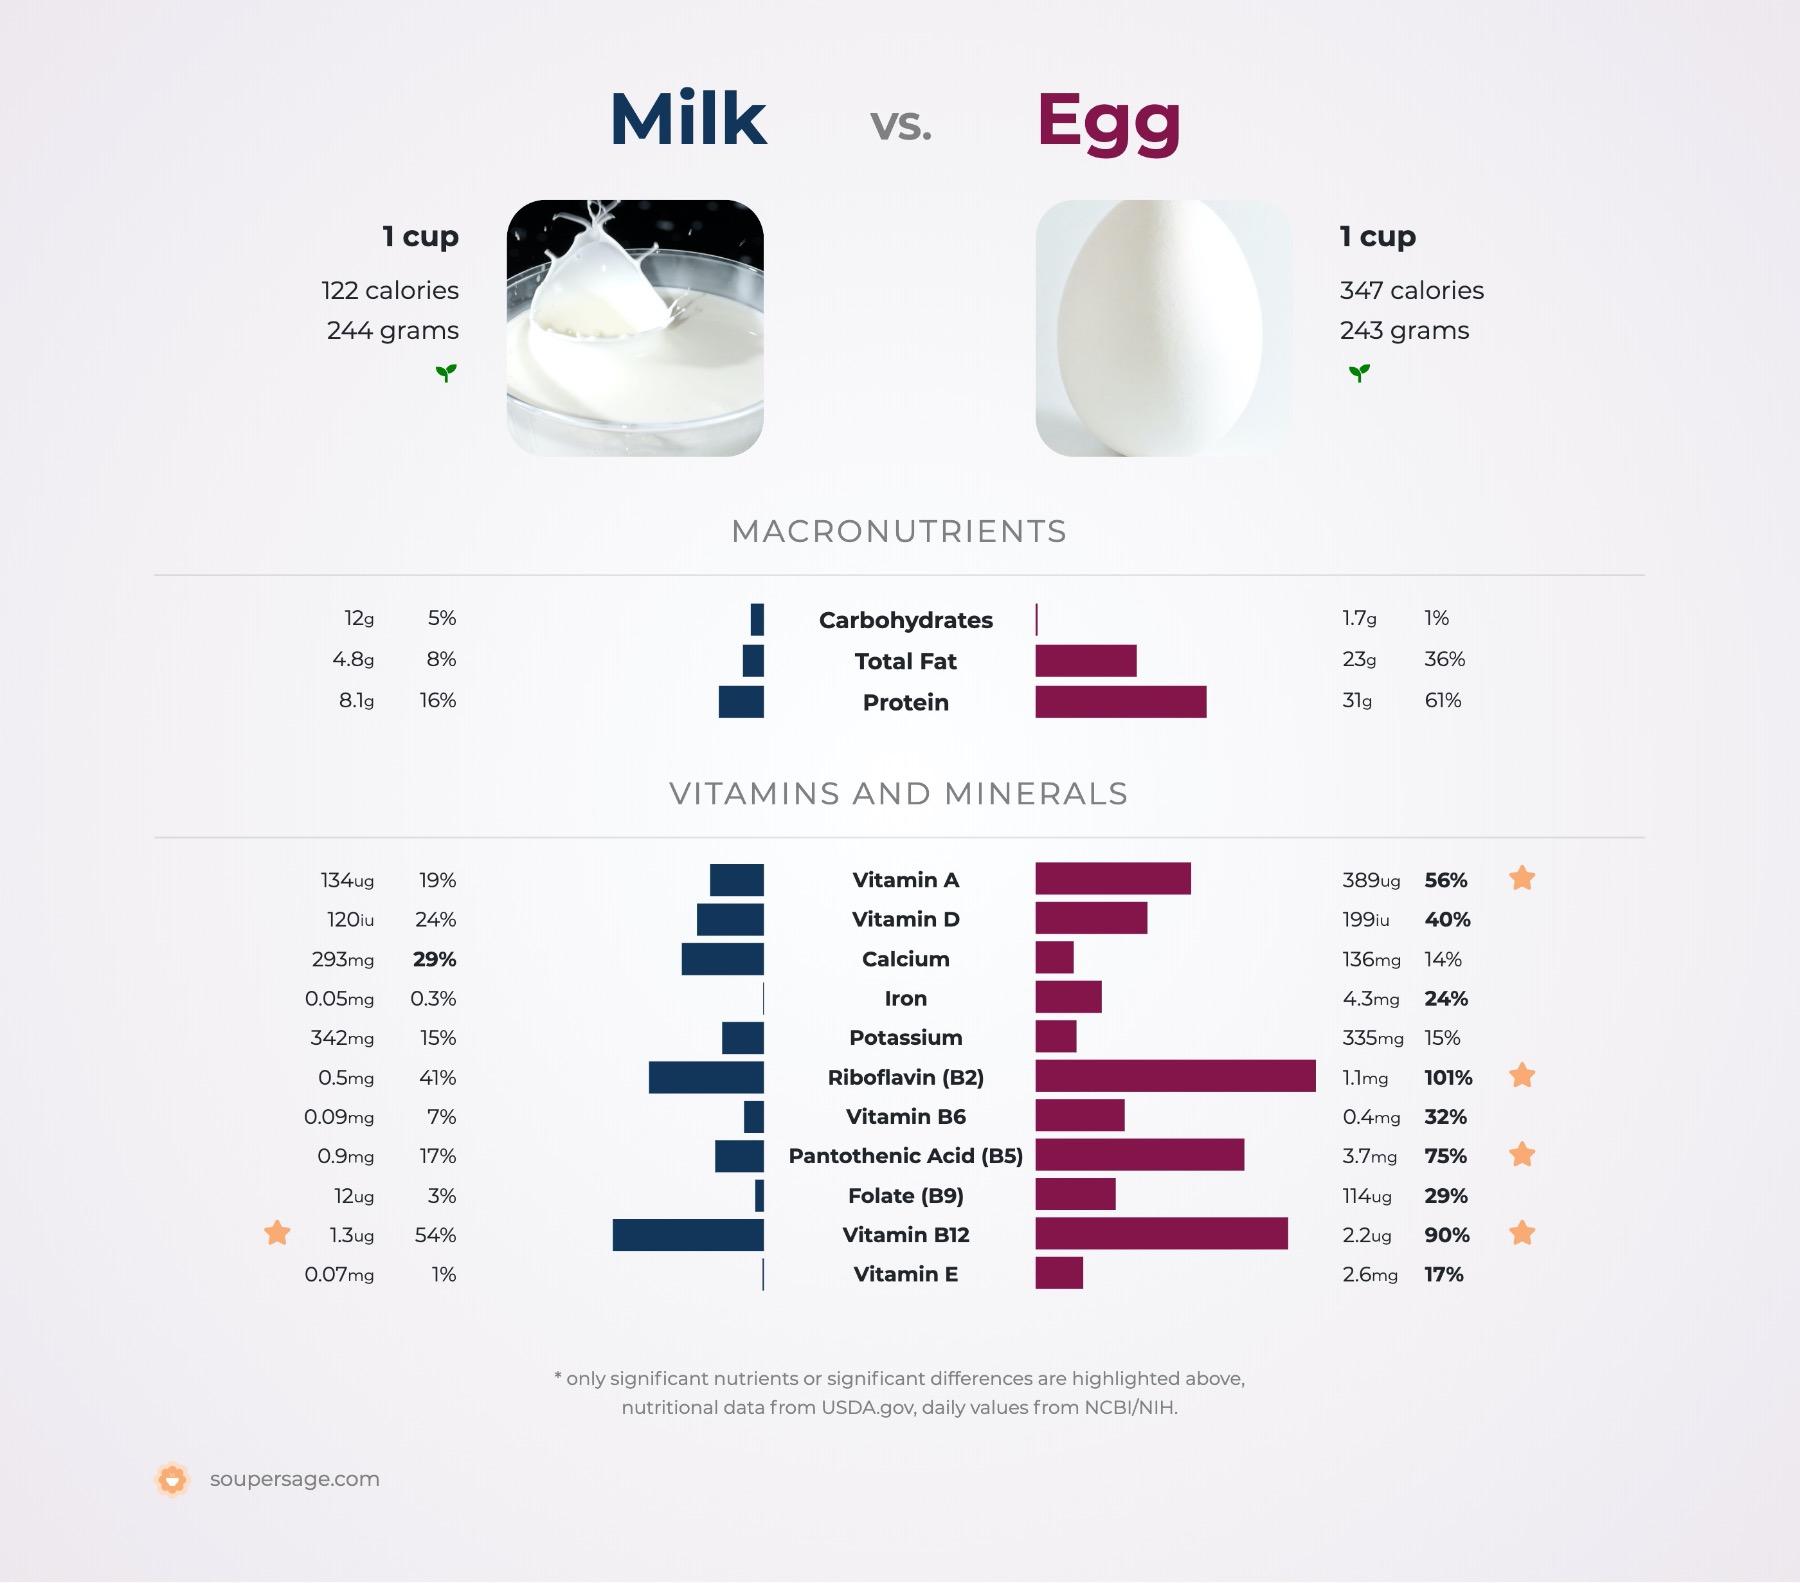 nutrition comparison of egg vs. milk